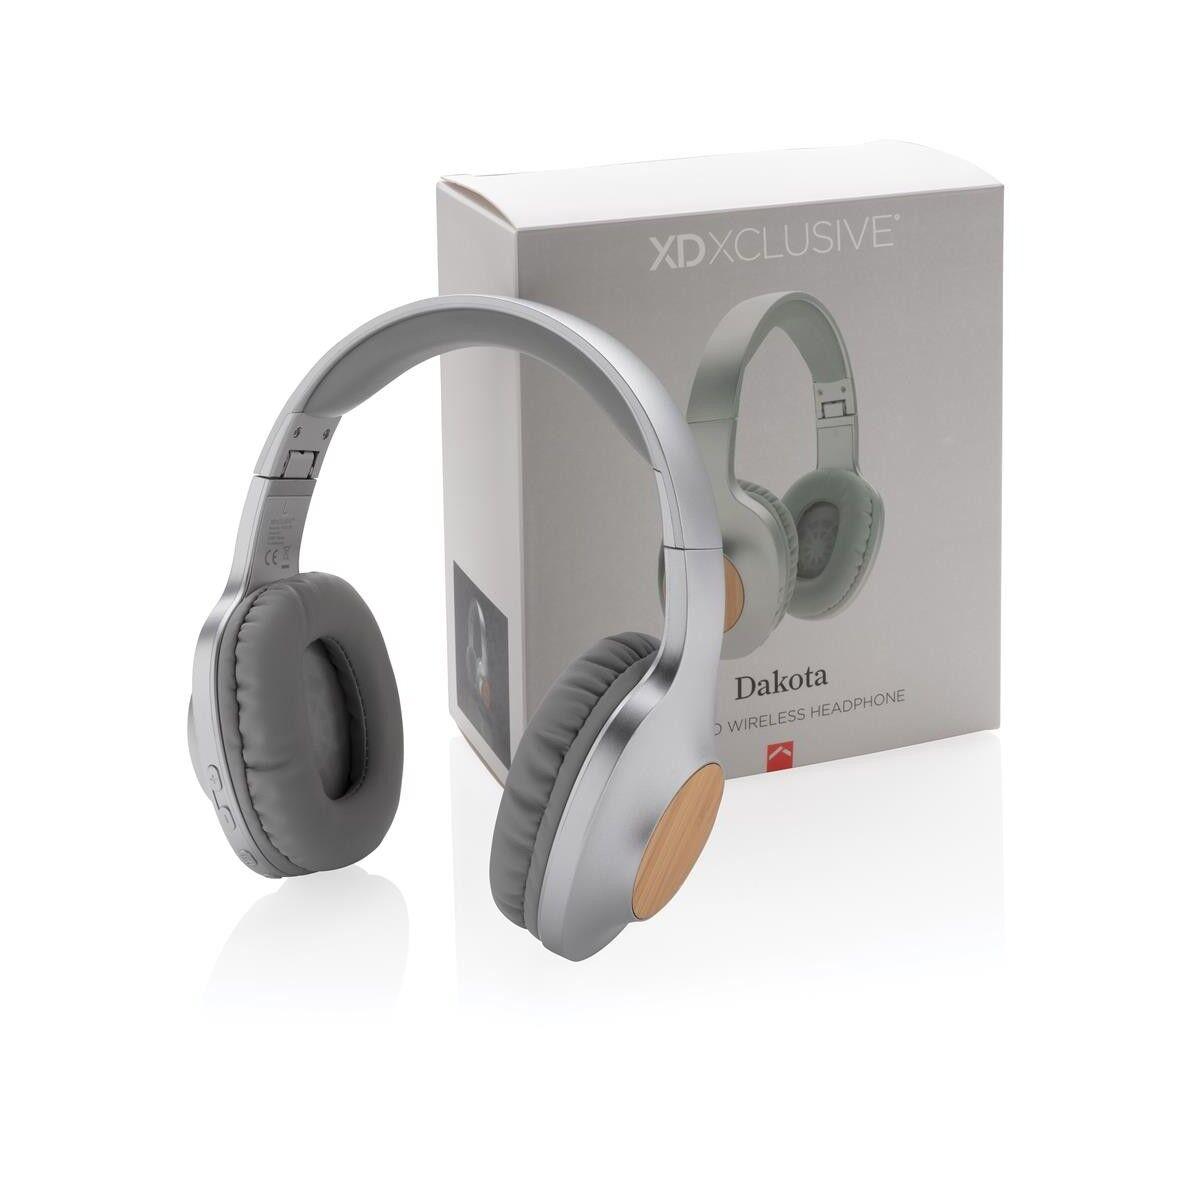 California Bamboo Wireless Headphones with gift box packaging